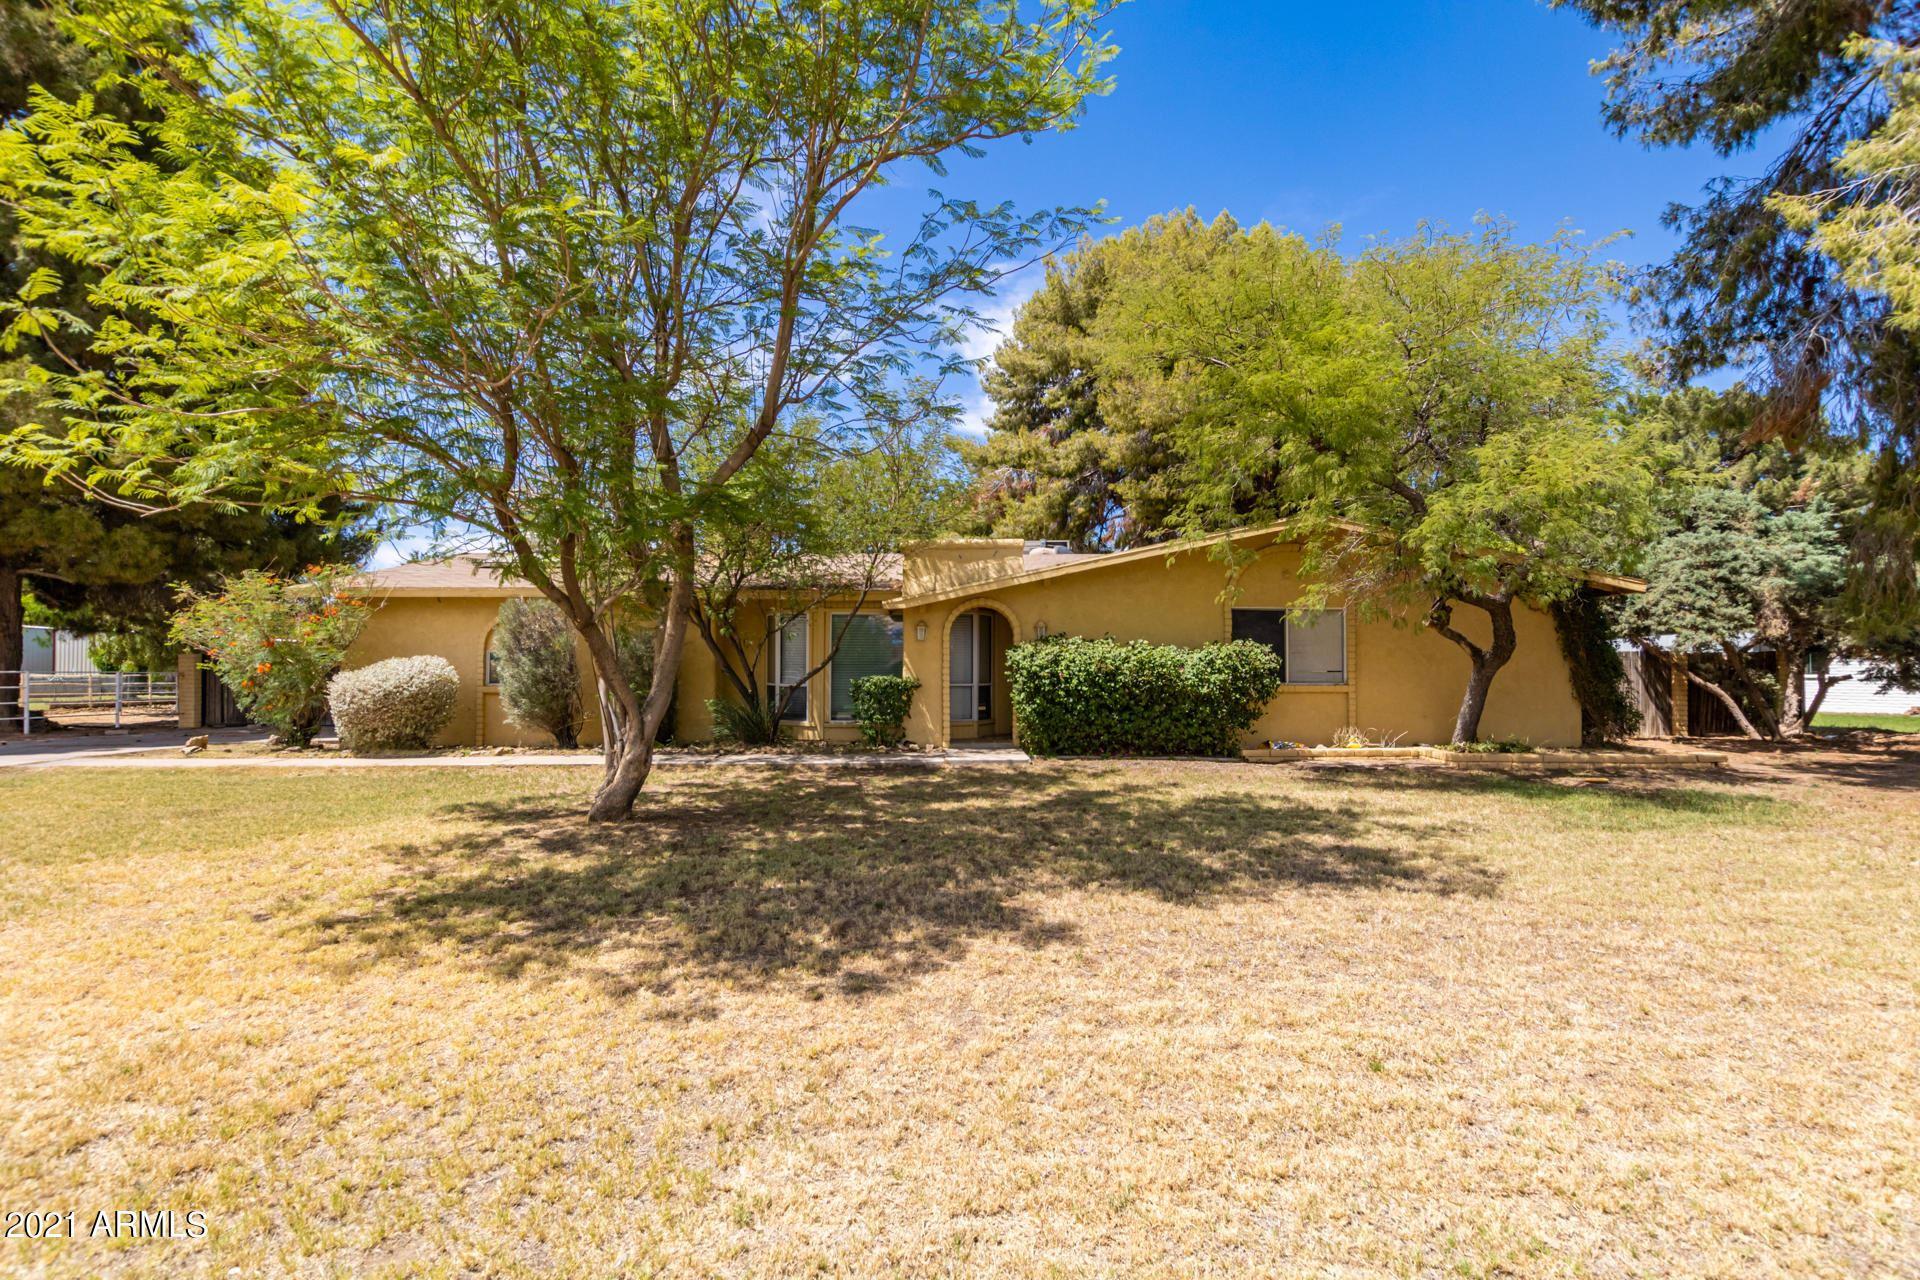 Photo of 10316 W CATALINA Drive, Avondale, AZ 85392 (MLS # 6248030)